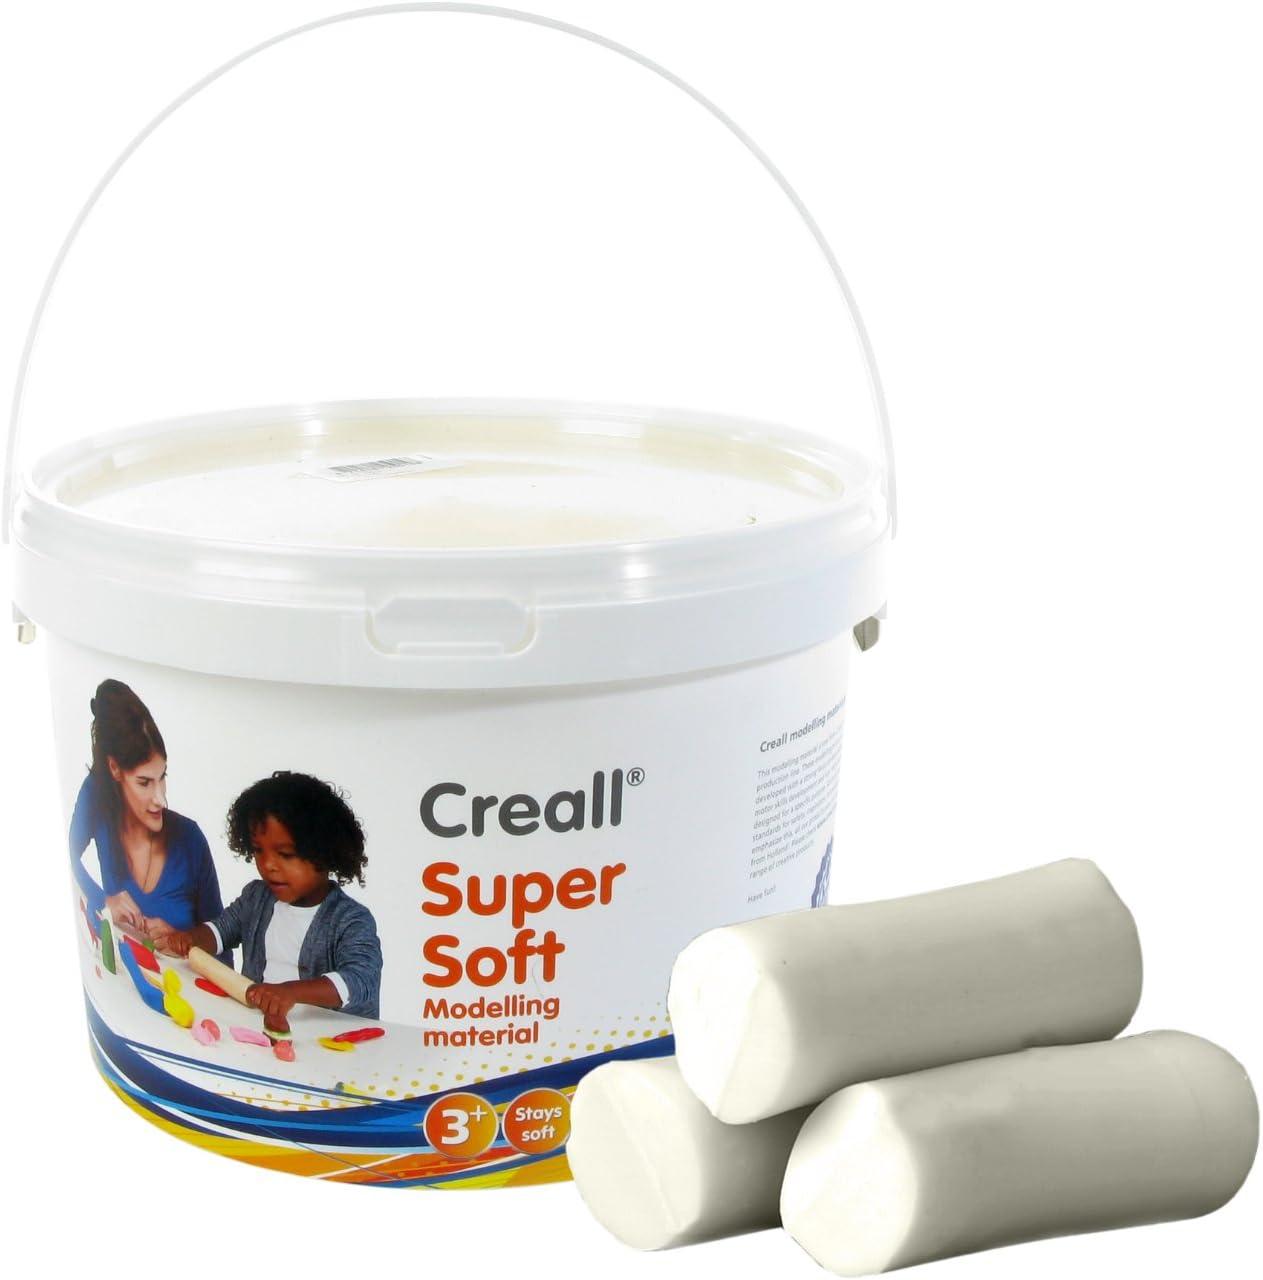 Creall havo25015/1750/g wei/ß Havo Super Soft Modellier Material Set